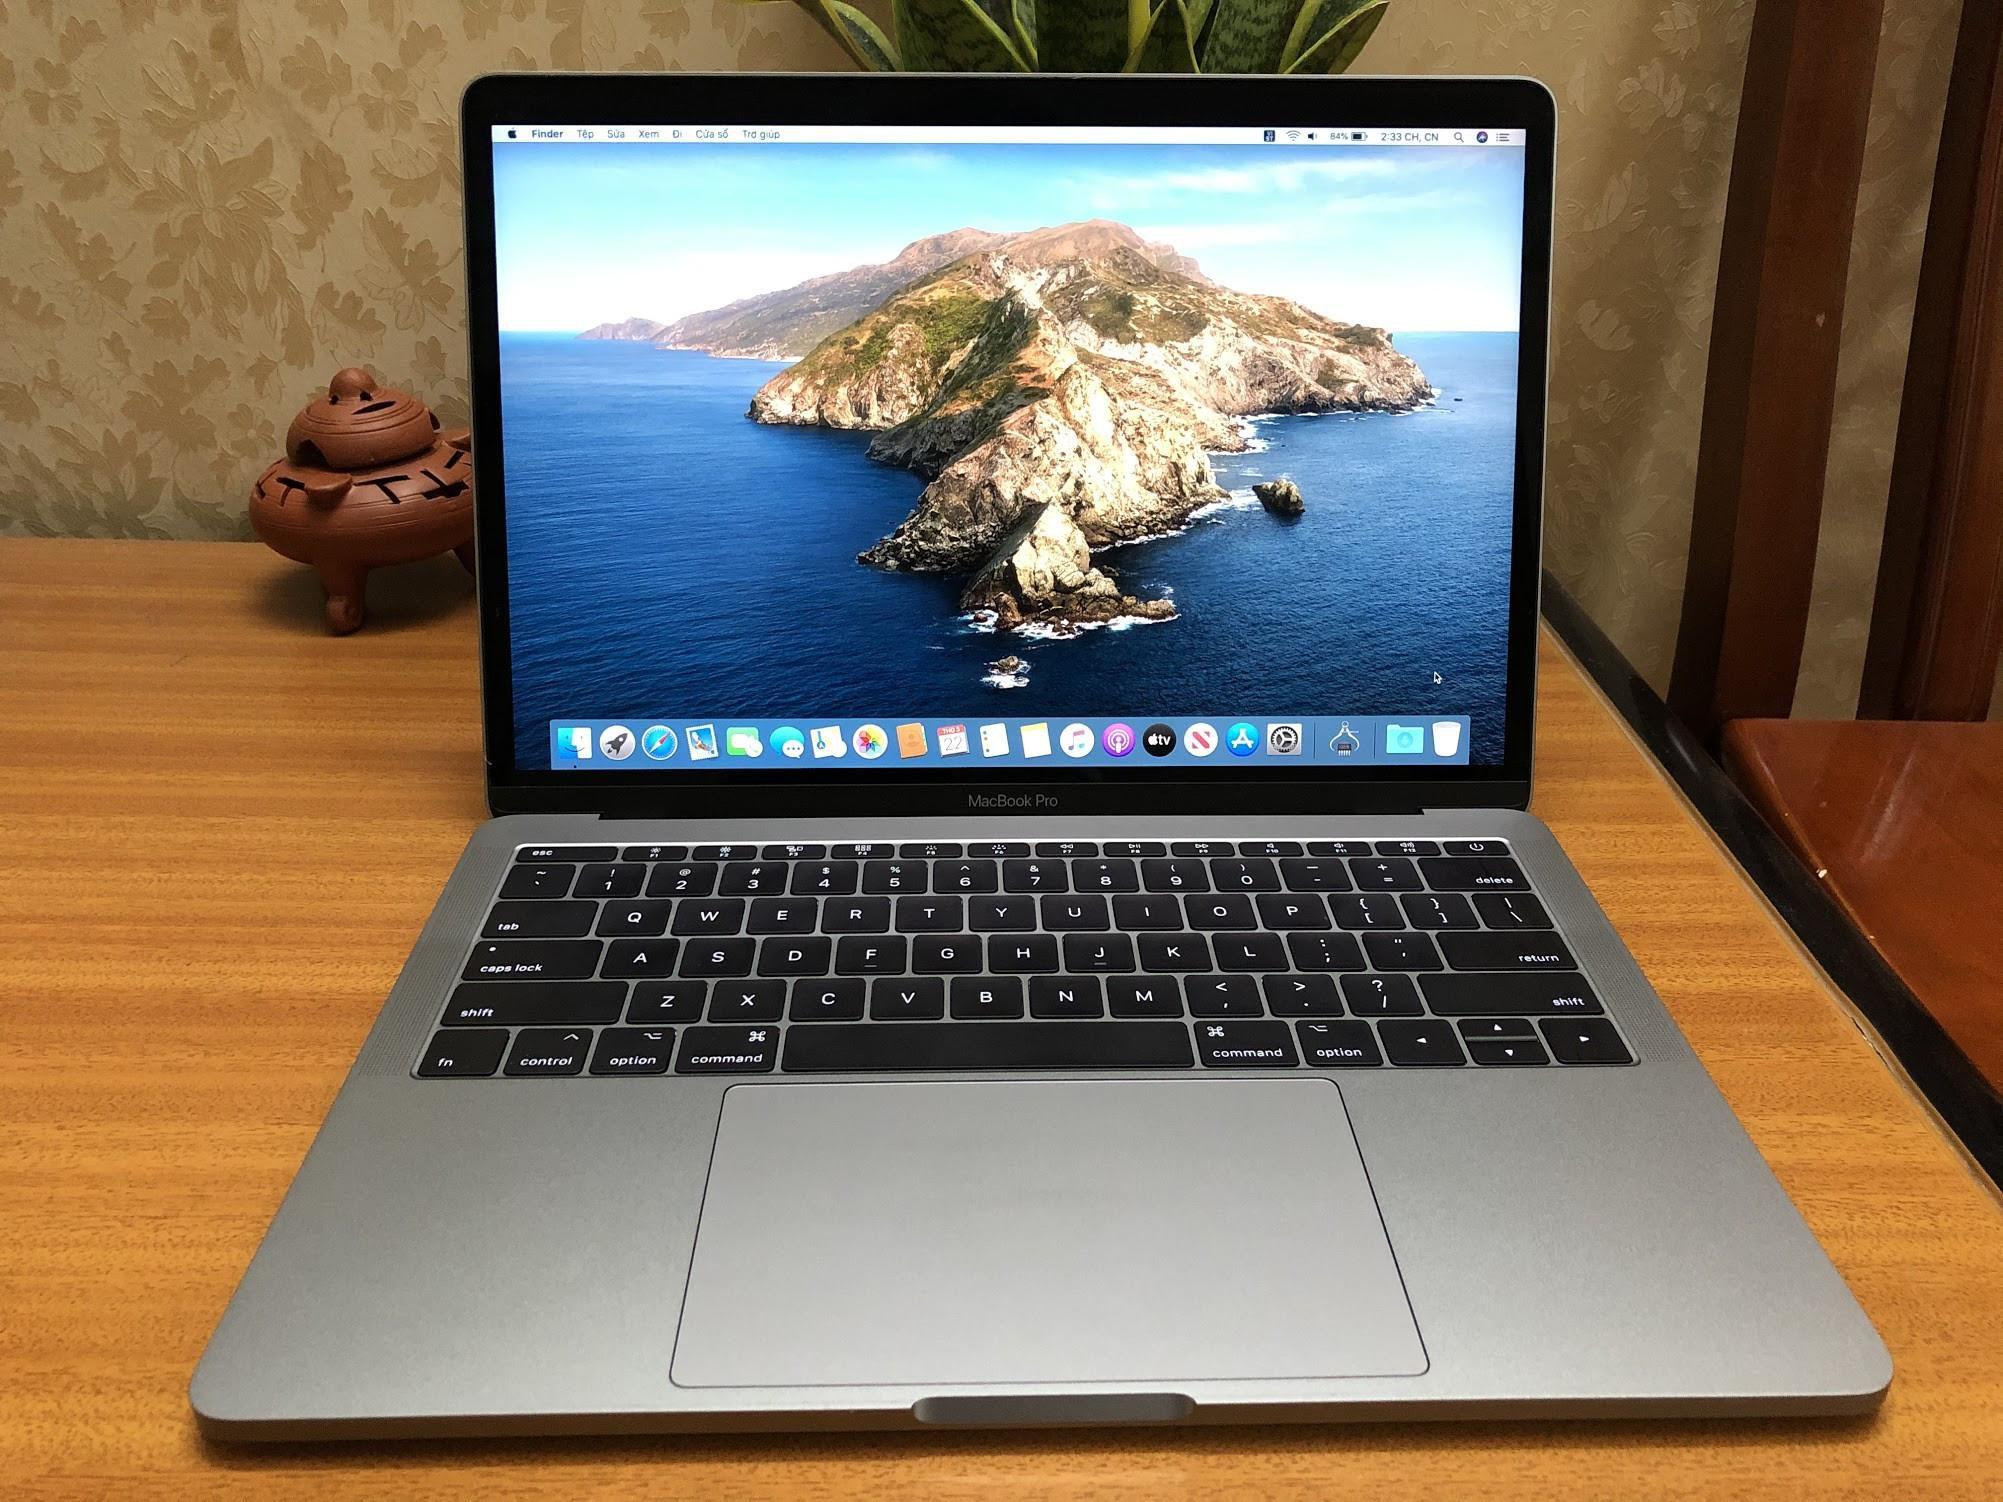 Macbook Pro 2017 13inch, Core I5/16GB/128GB